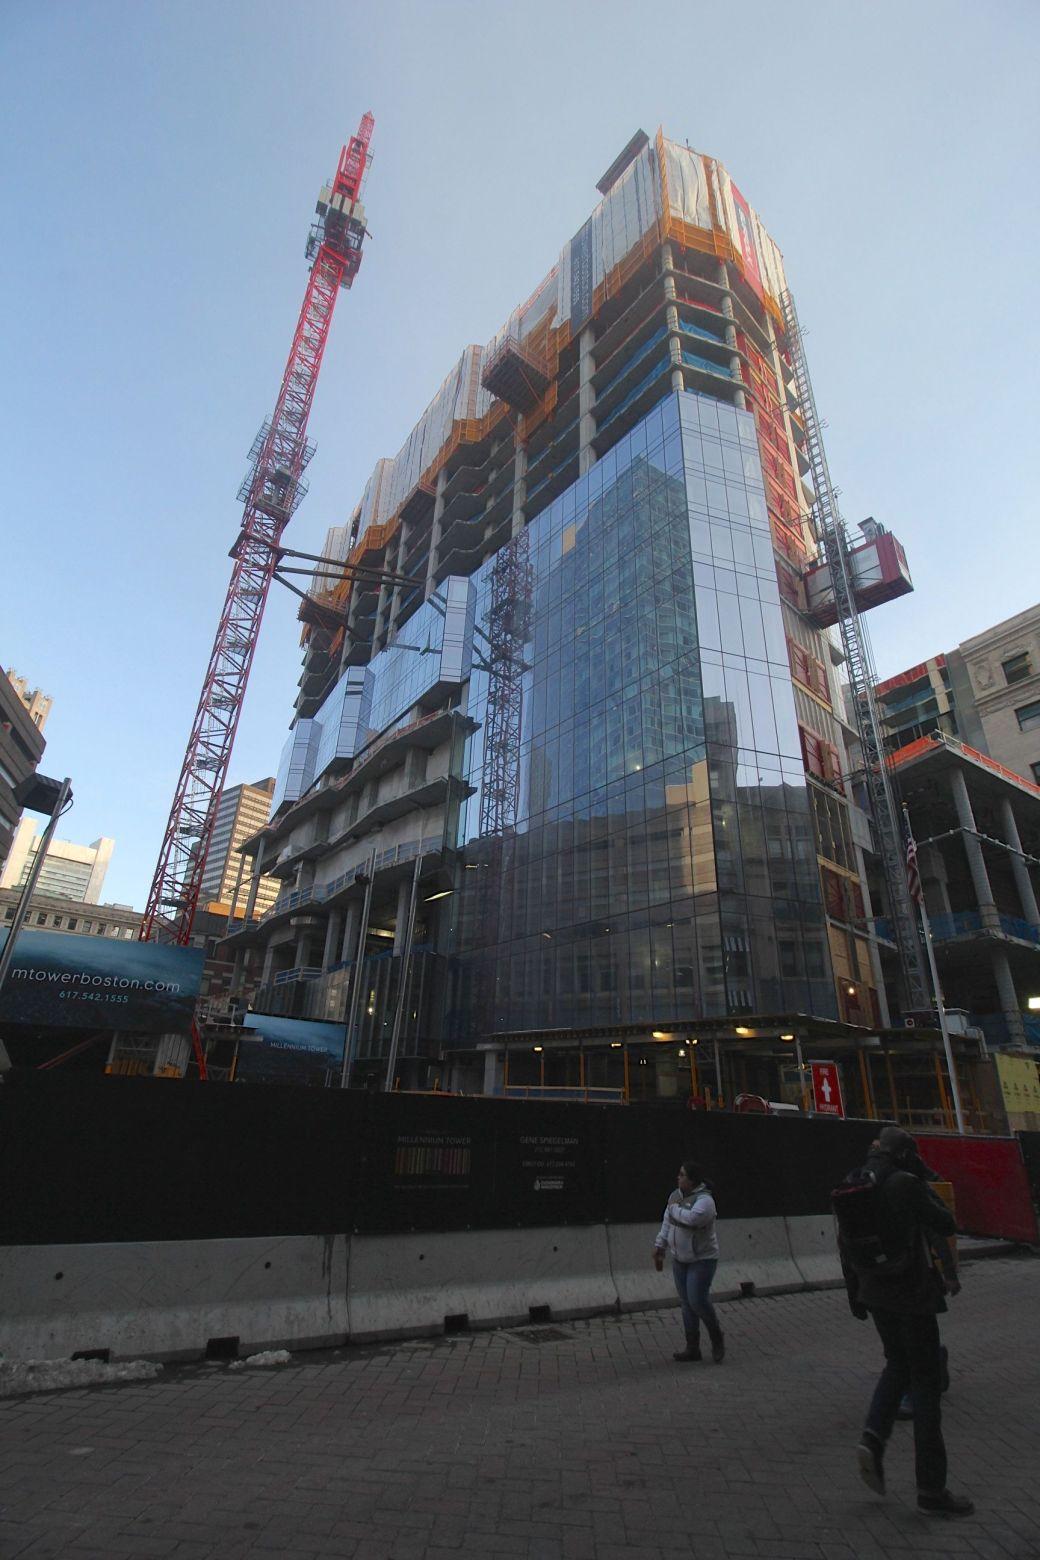 boston-millenium-tower-march-16-2015